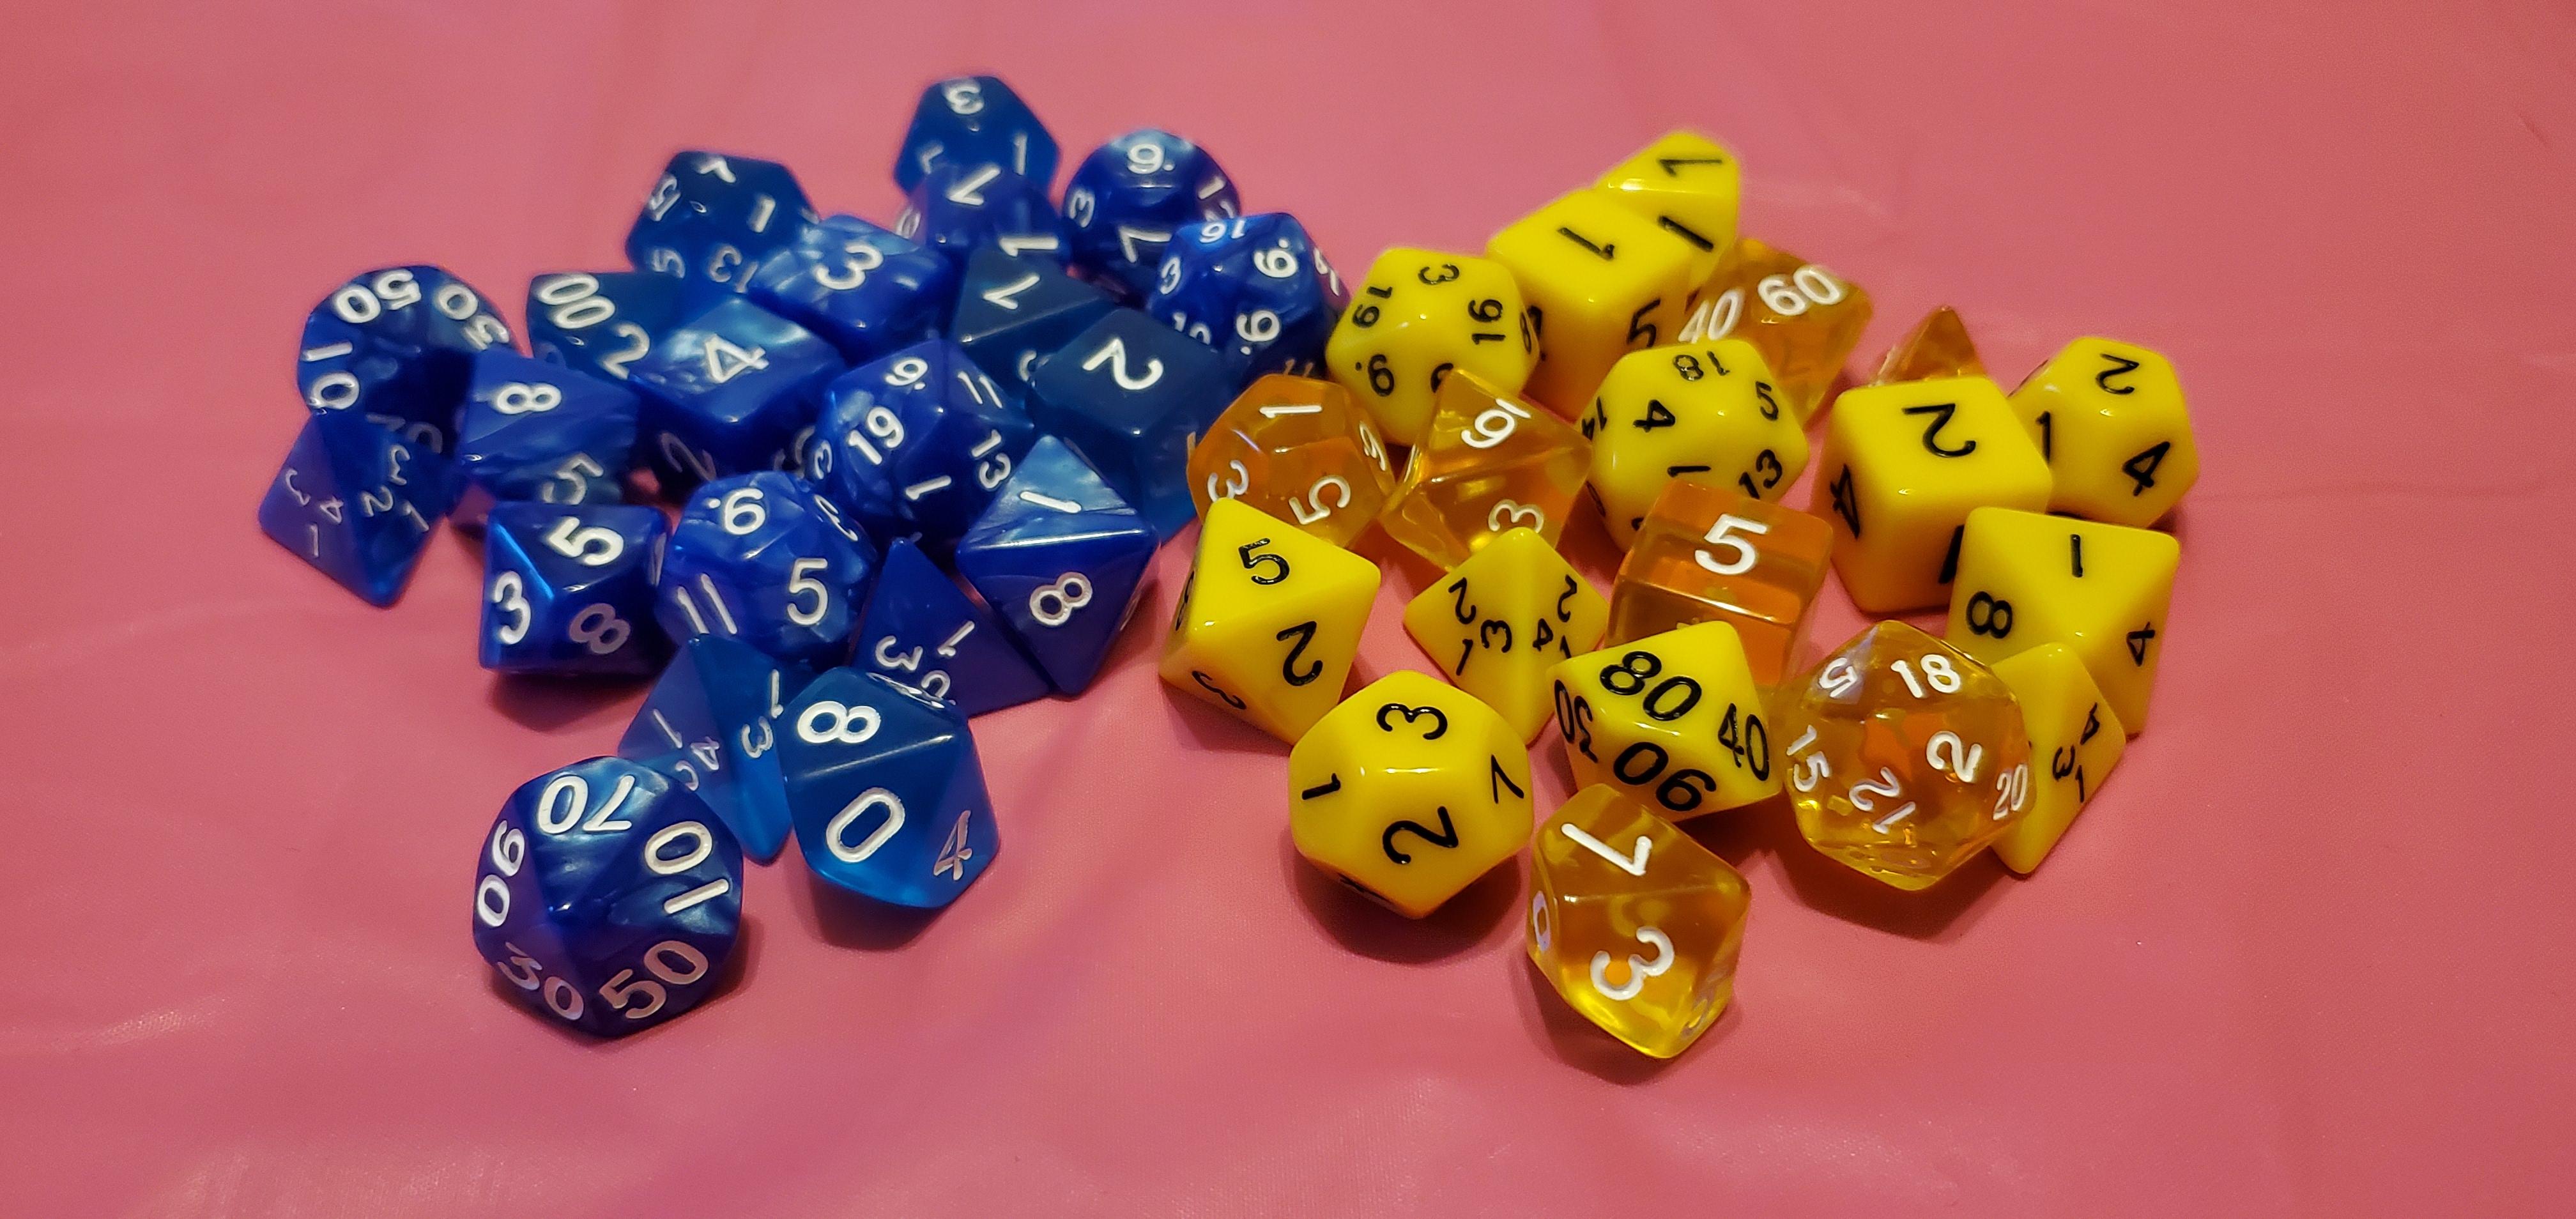 Sets of RPG game dice.